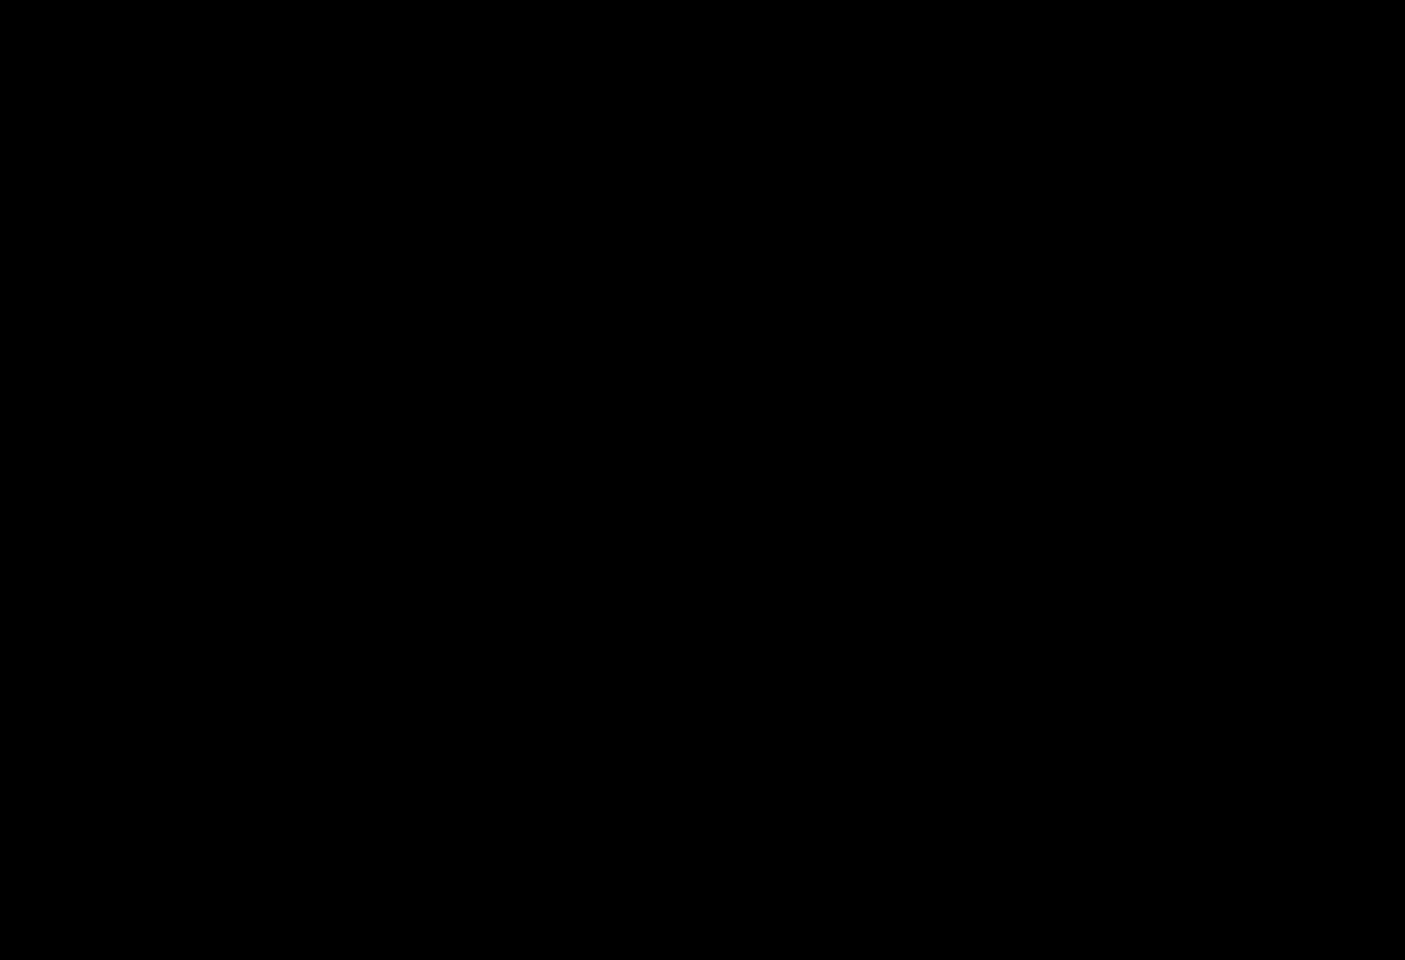 TVG in Mittelamerika